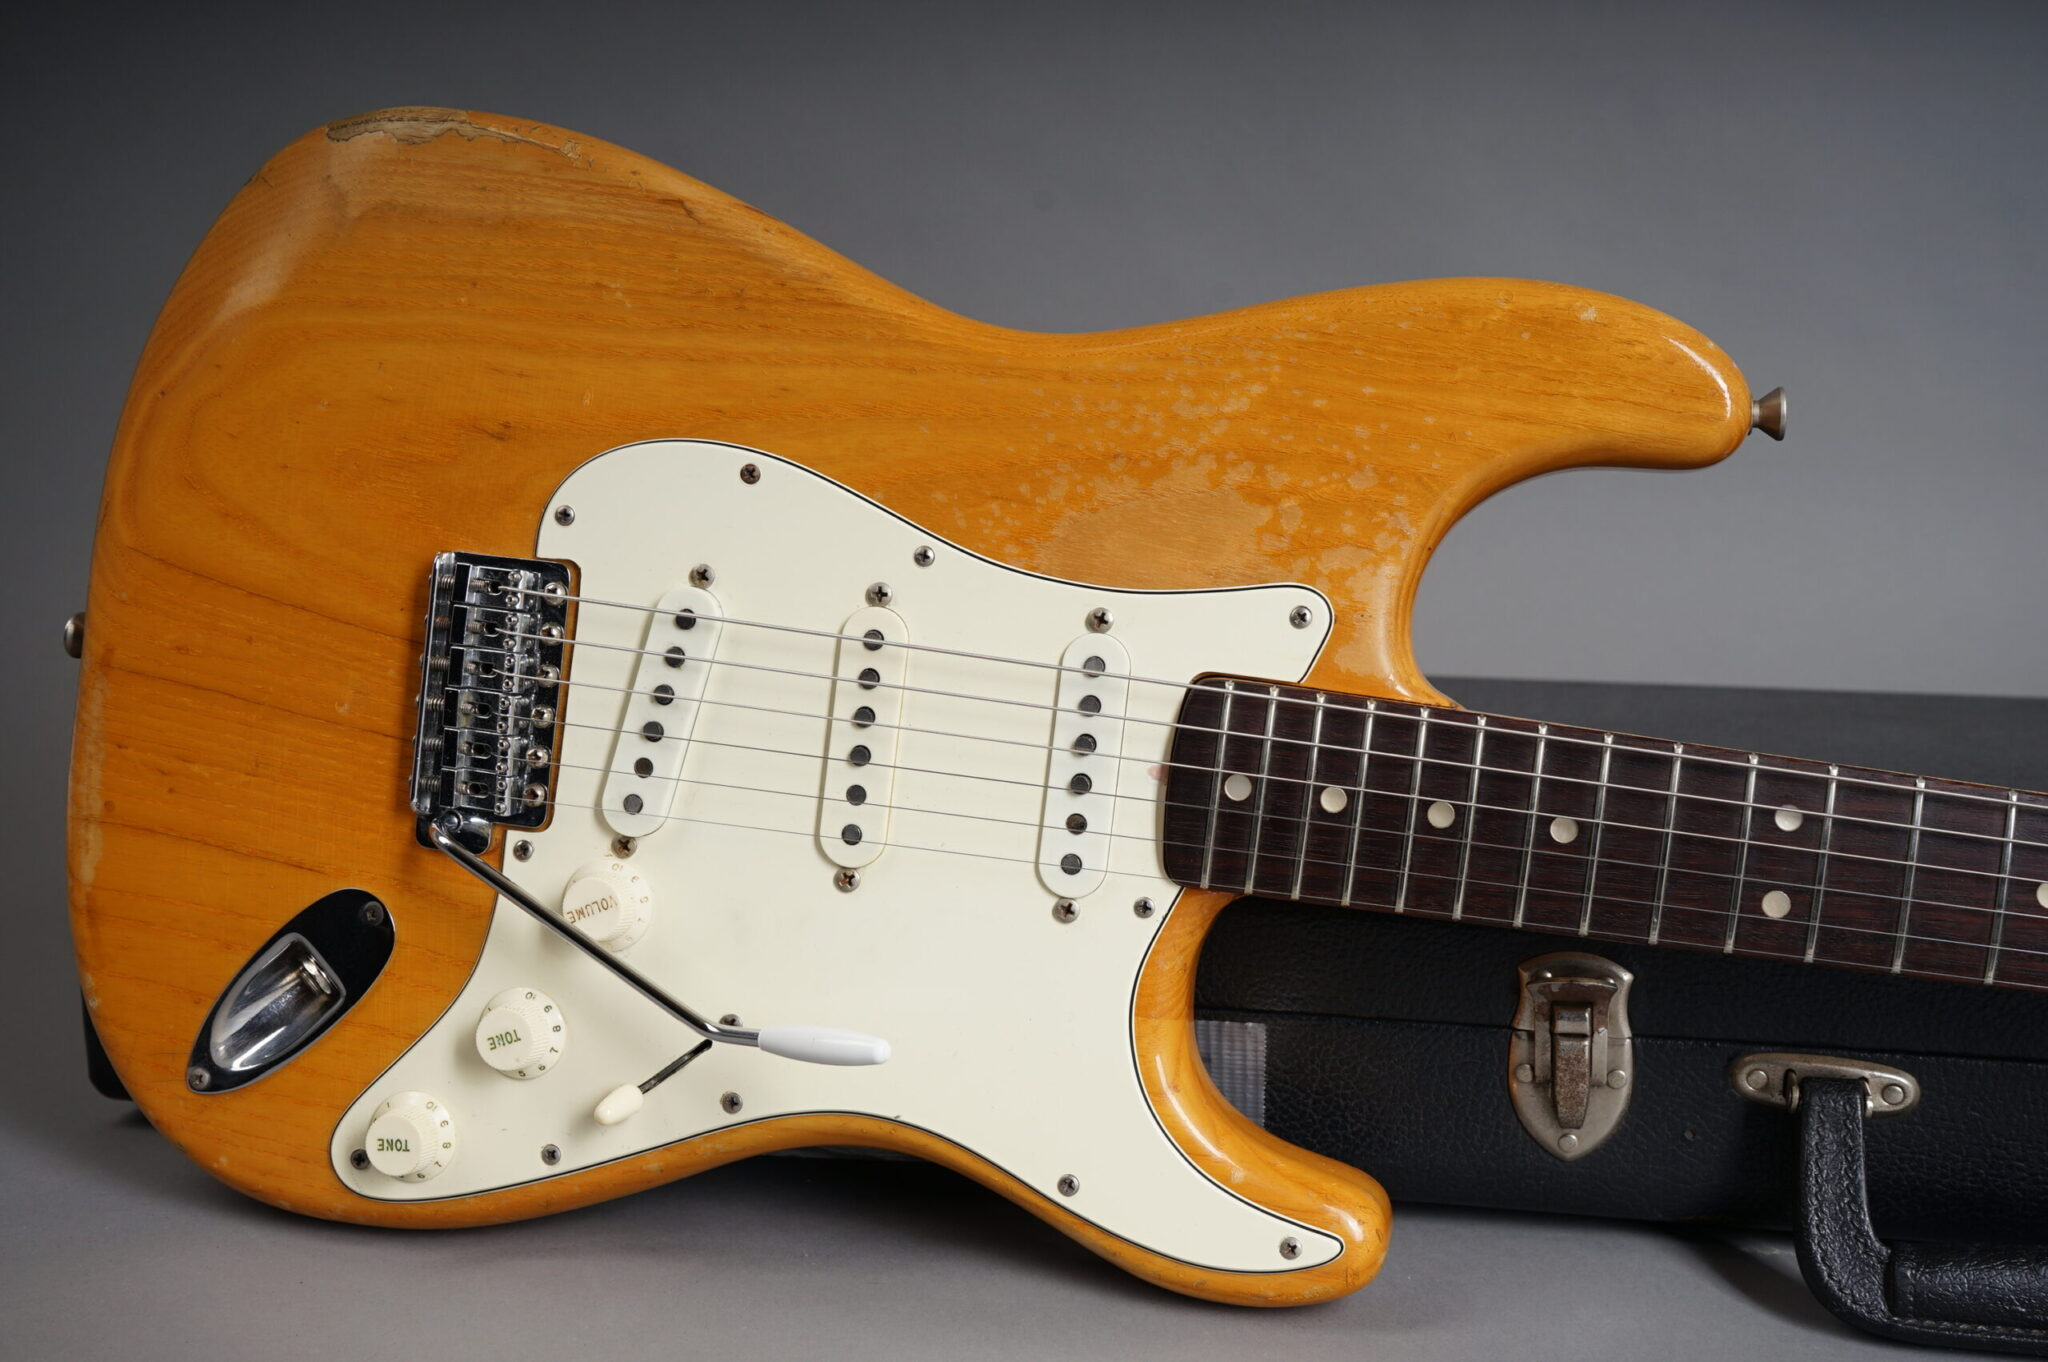 https://guitarpoint.de/app/uploads/products/1973-fender-stratocaster-natural/1973-Fender-Stratocaster-Natural-RW-379991-10-scaled-2048x1362.jpg